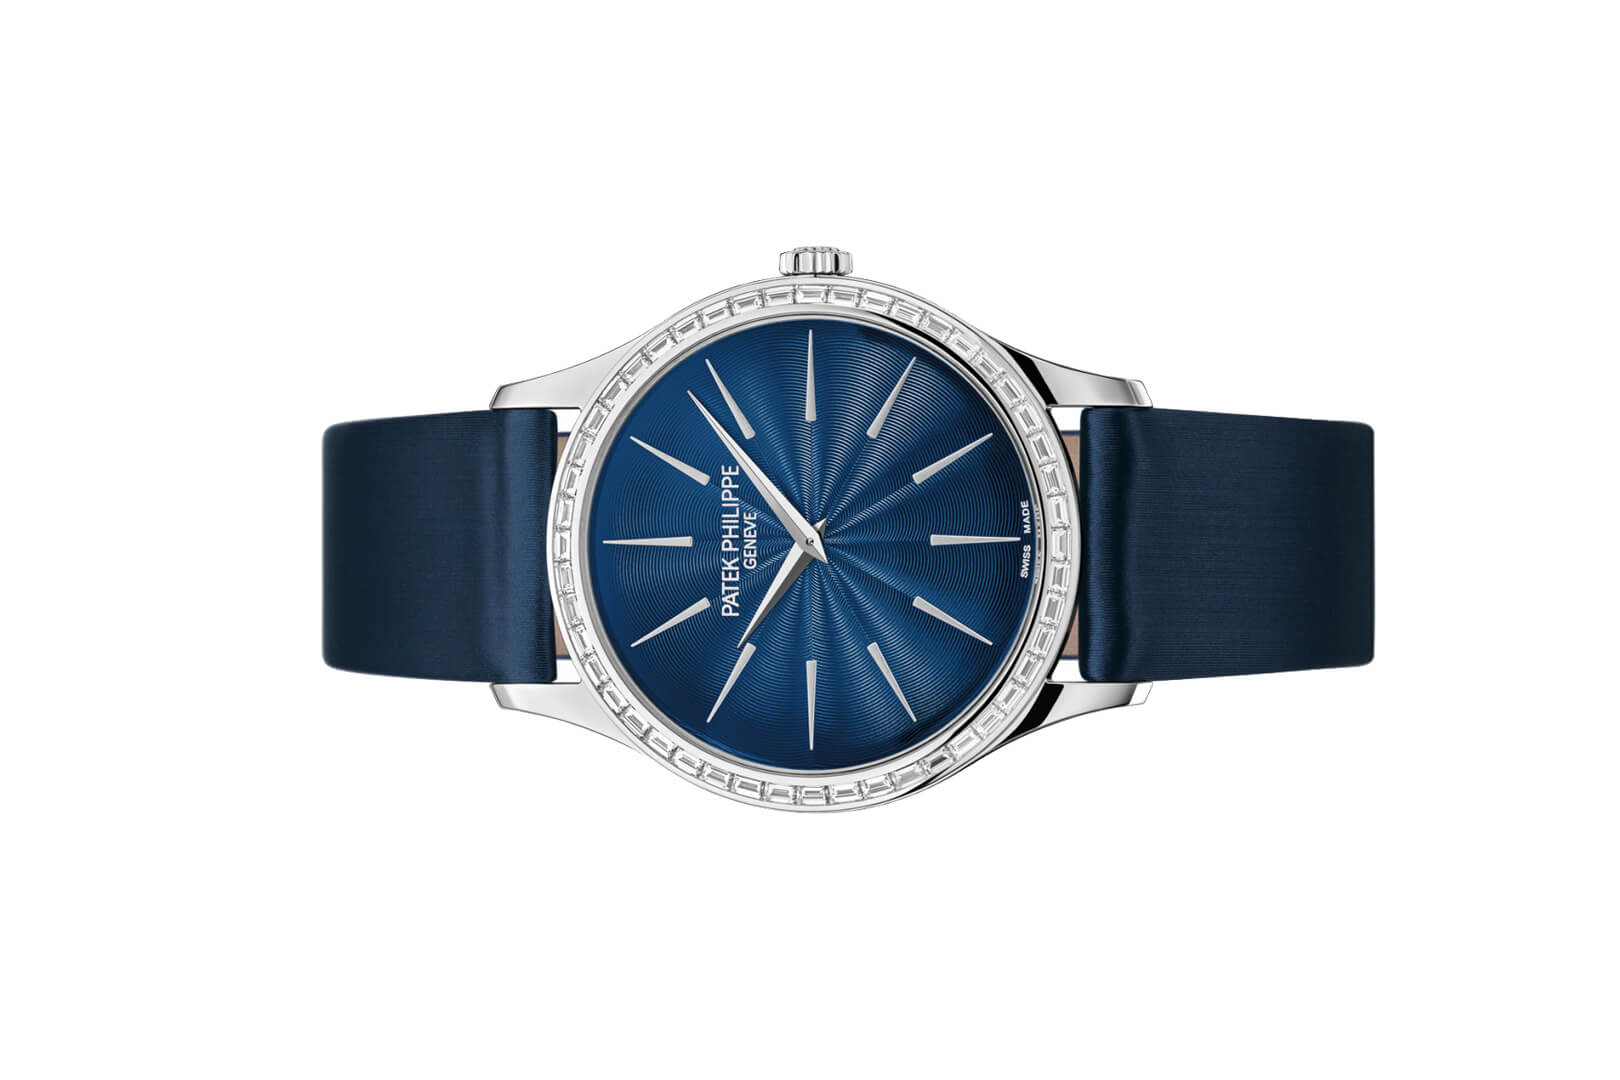 Đồng hồ Patek Philippe Calatrava 4897/300G-001